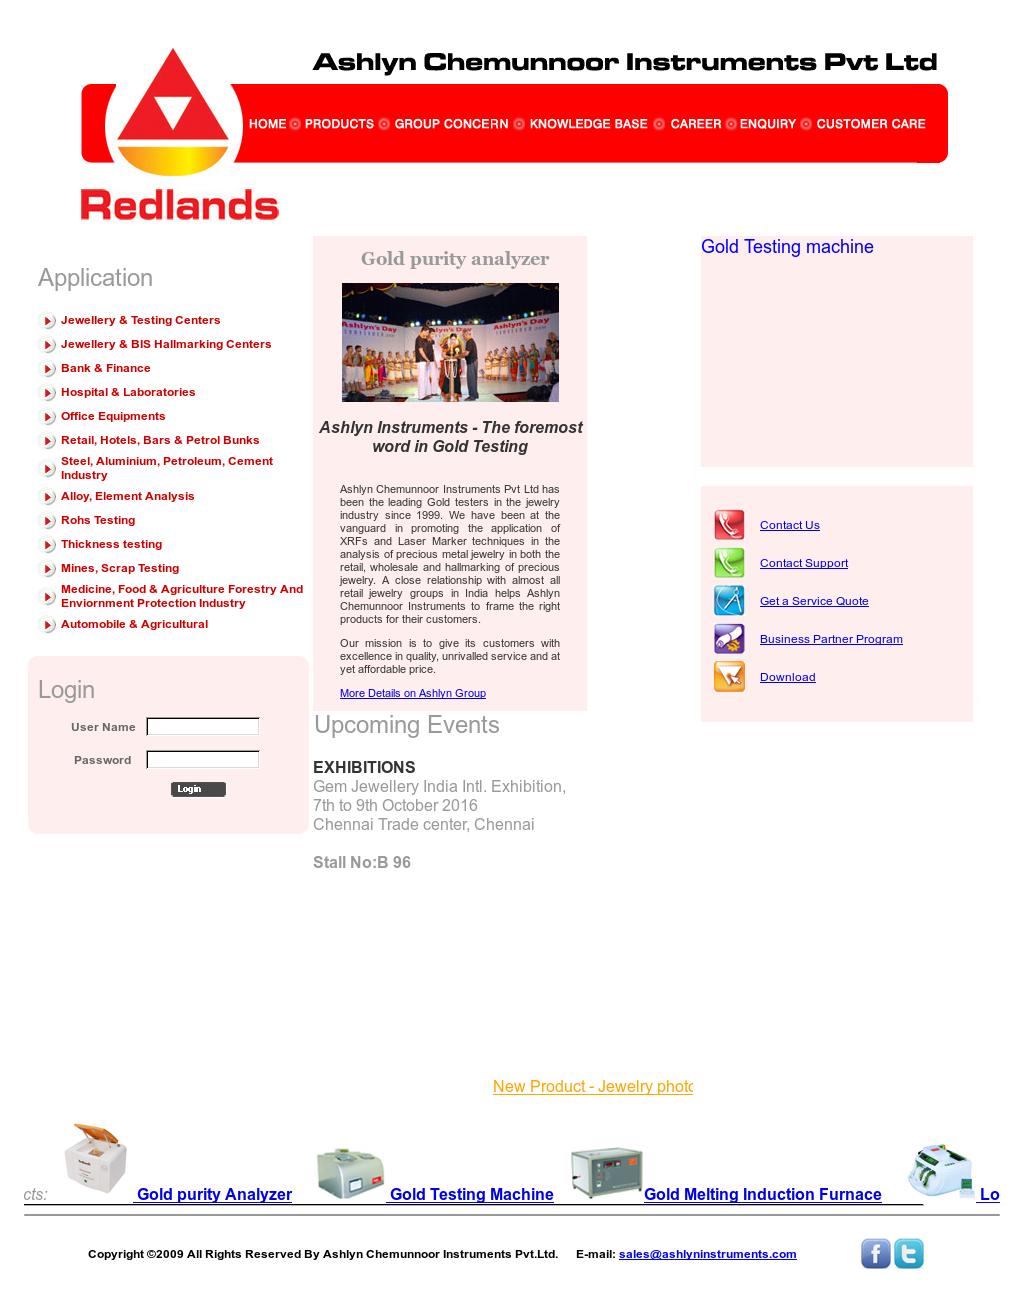 Ashlyn Chemunnoor Instruments Competitors, Revenue and